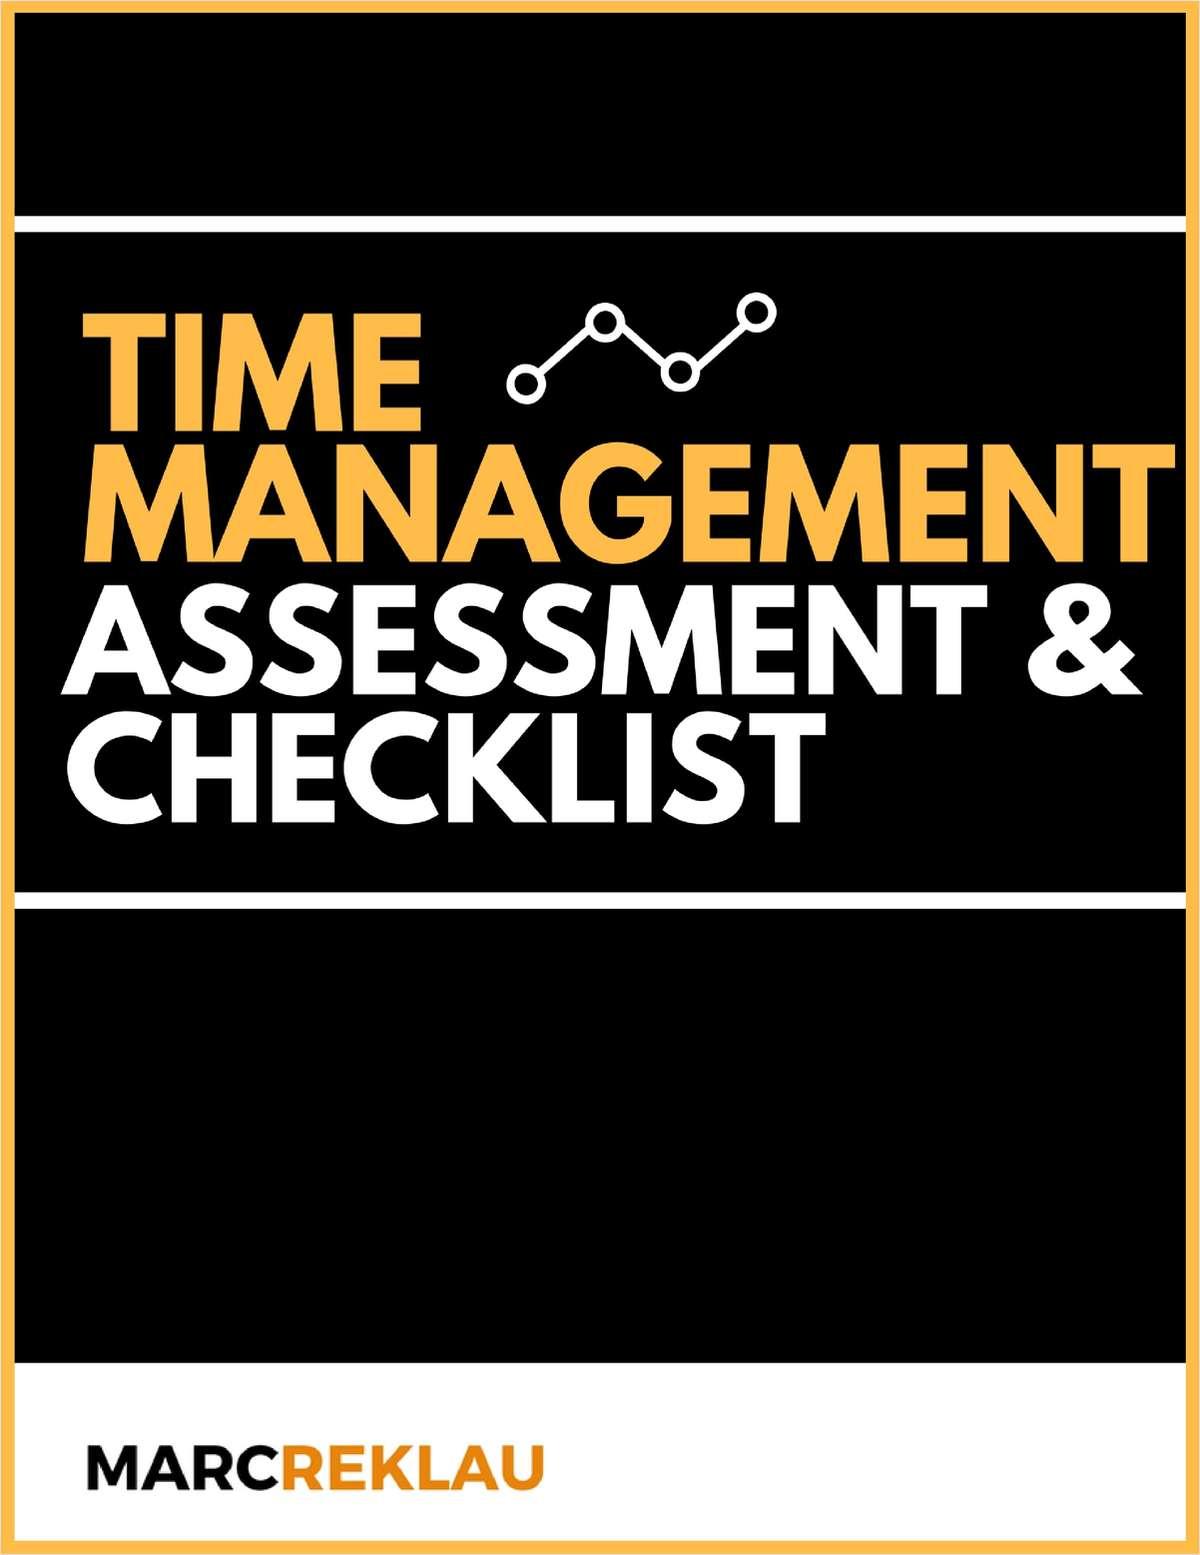 Time Management Assessment & Checklist